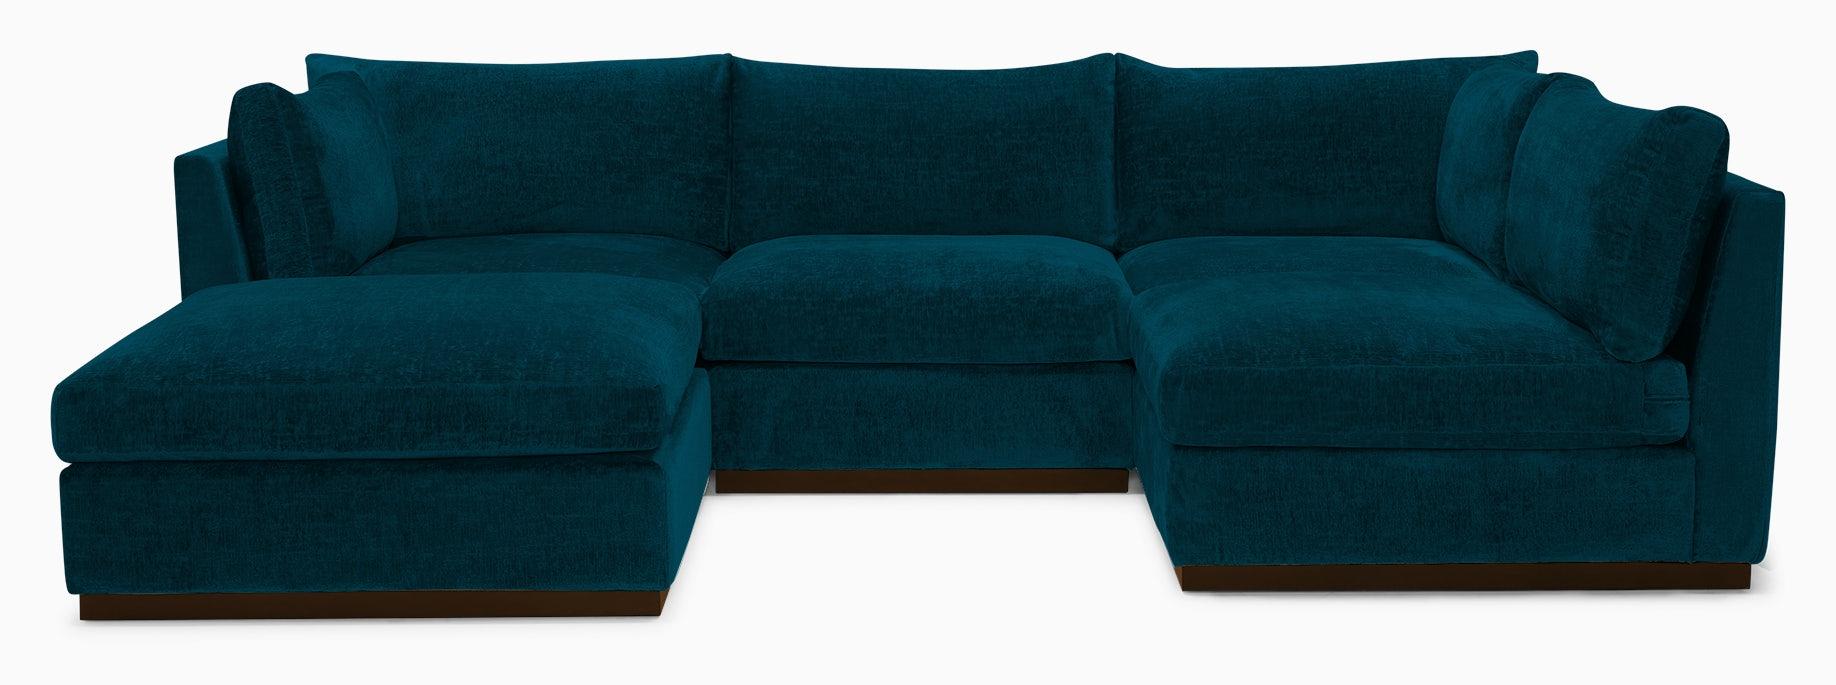 holt armless sofa sectional %285 piece%29 key largo zenith teal